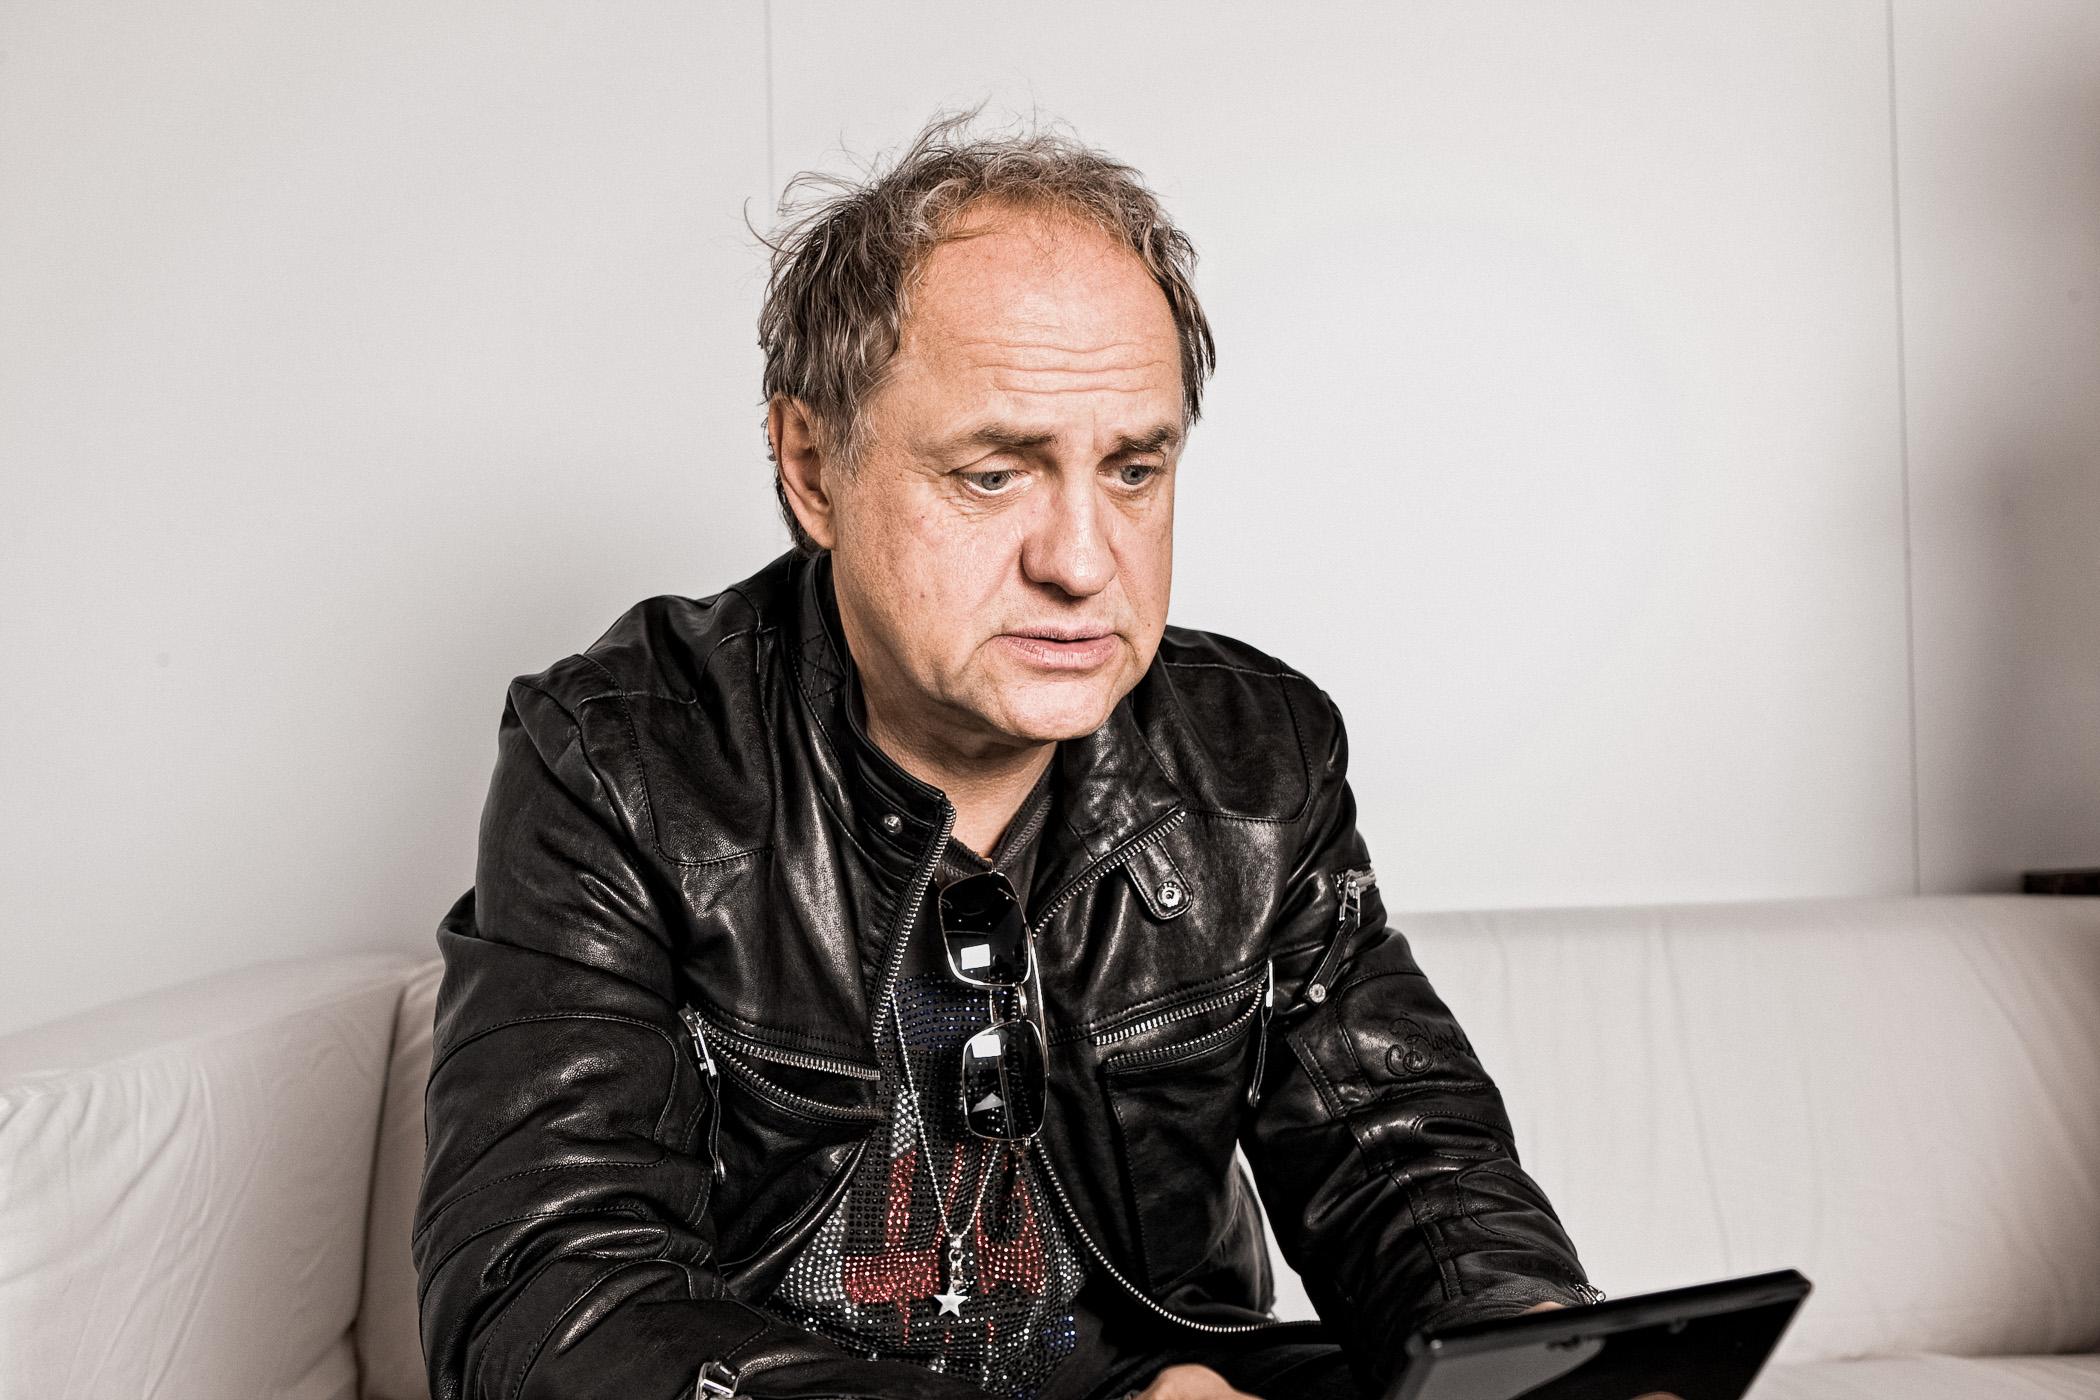 Uwe Ochsenknecht, Schauspieler, Florian Kresse, Fotograf, Peoplefotografie, Portrait, Actor